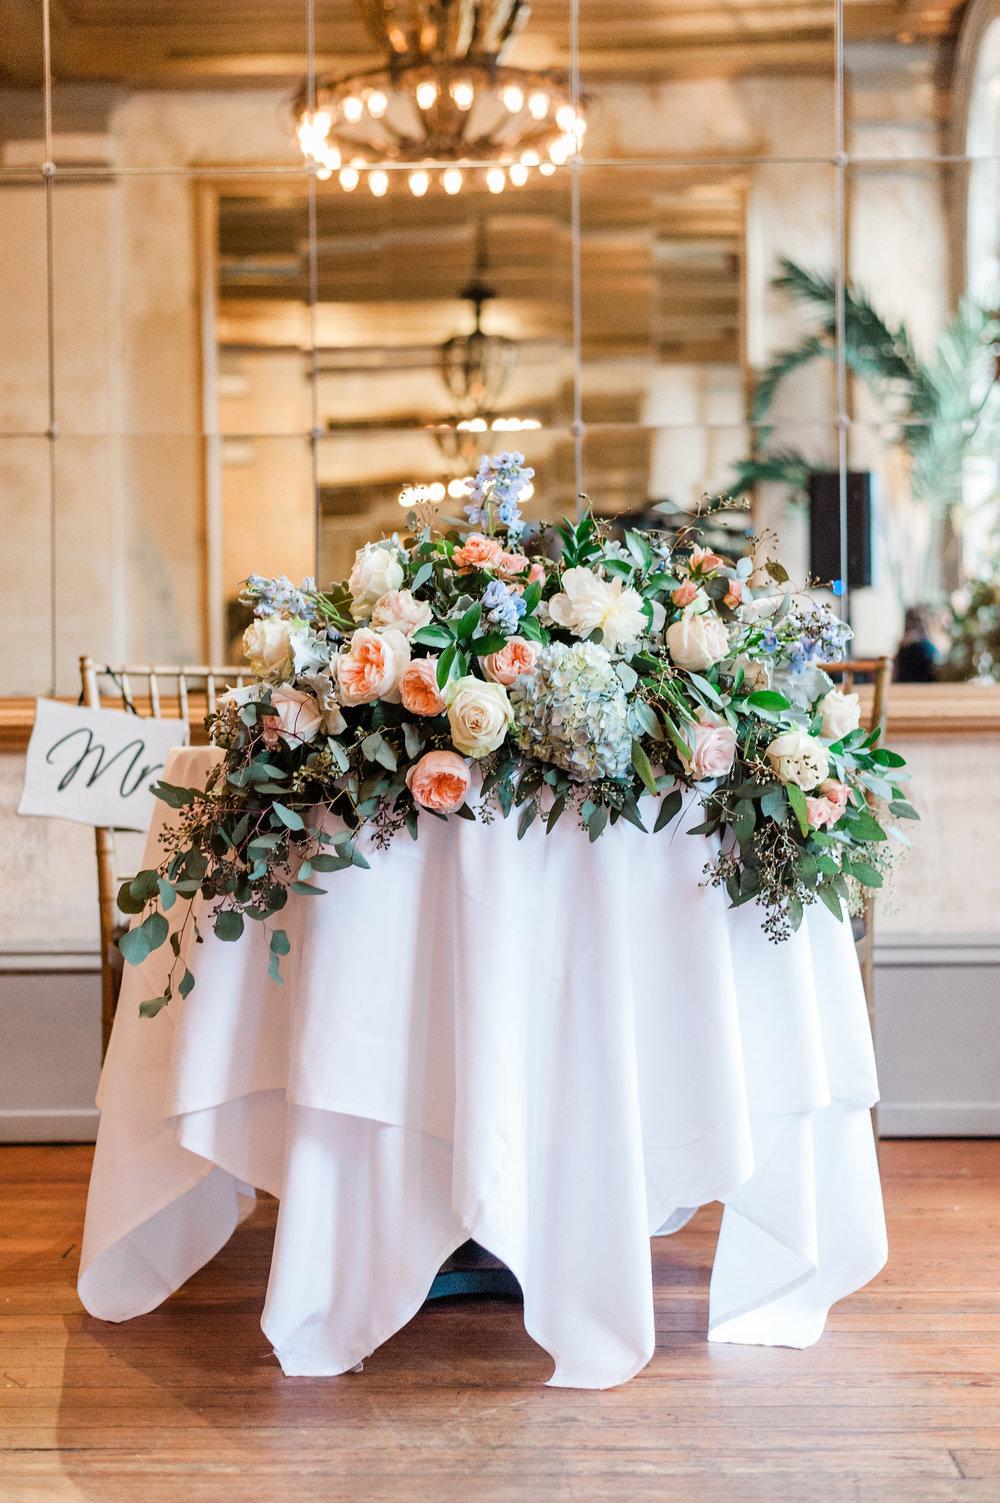 ivory-and-beau-bridal-boutique-i-and-b-florals-kim-and-luke-apt-b-photography-garibaldis-cafe-savannah-savannah-vintage-rentals-59.JPG